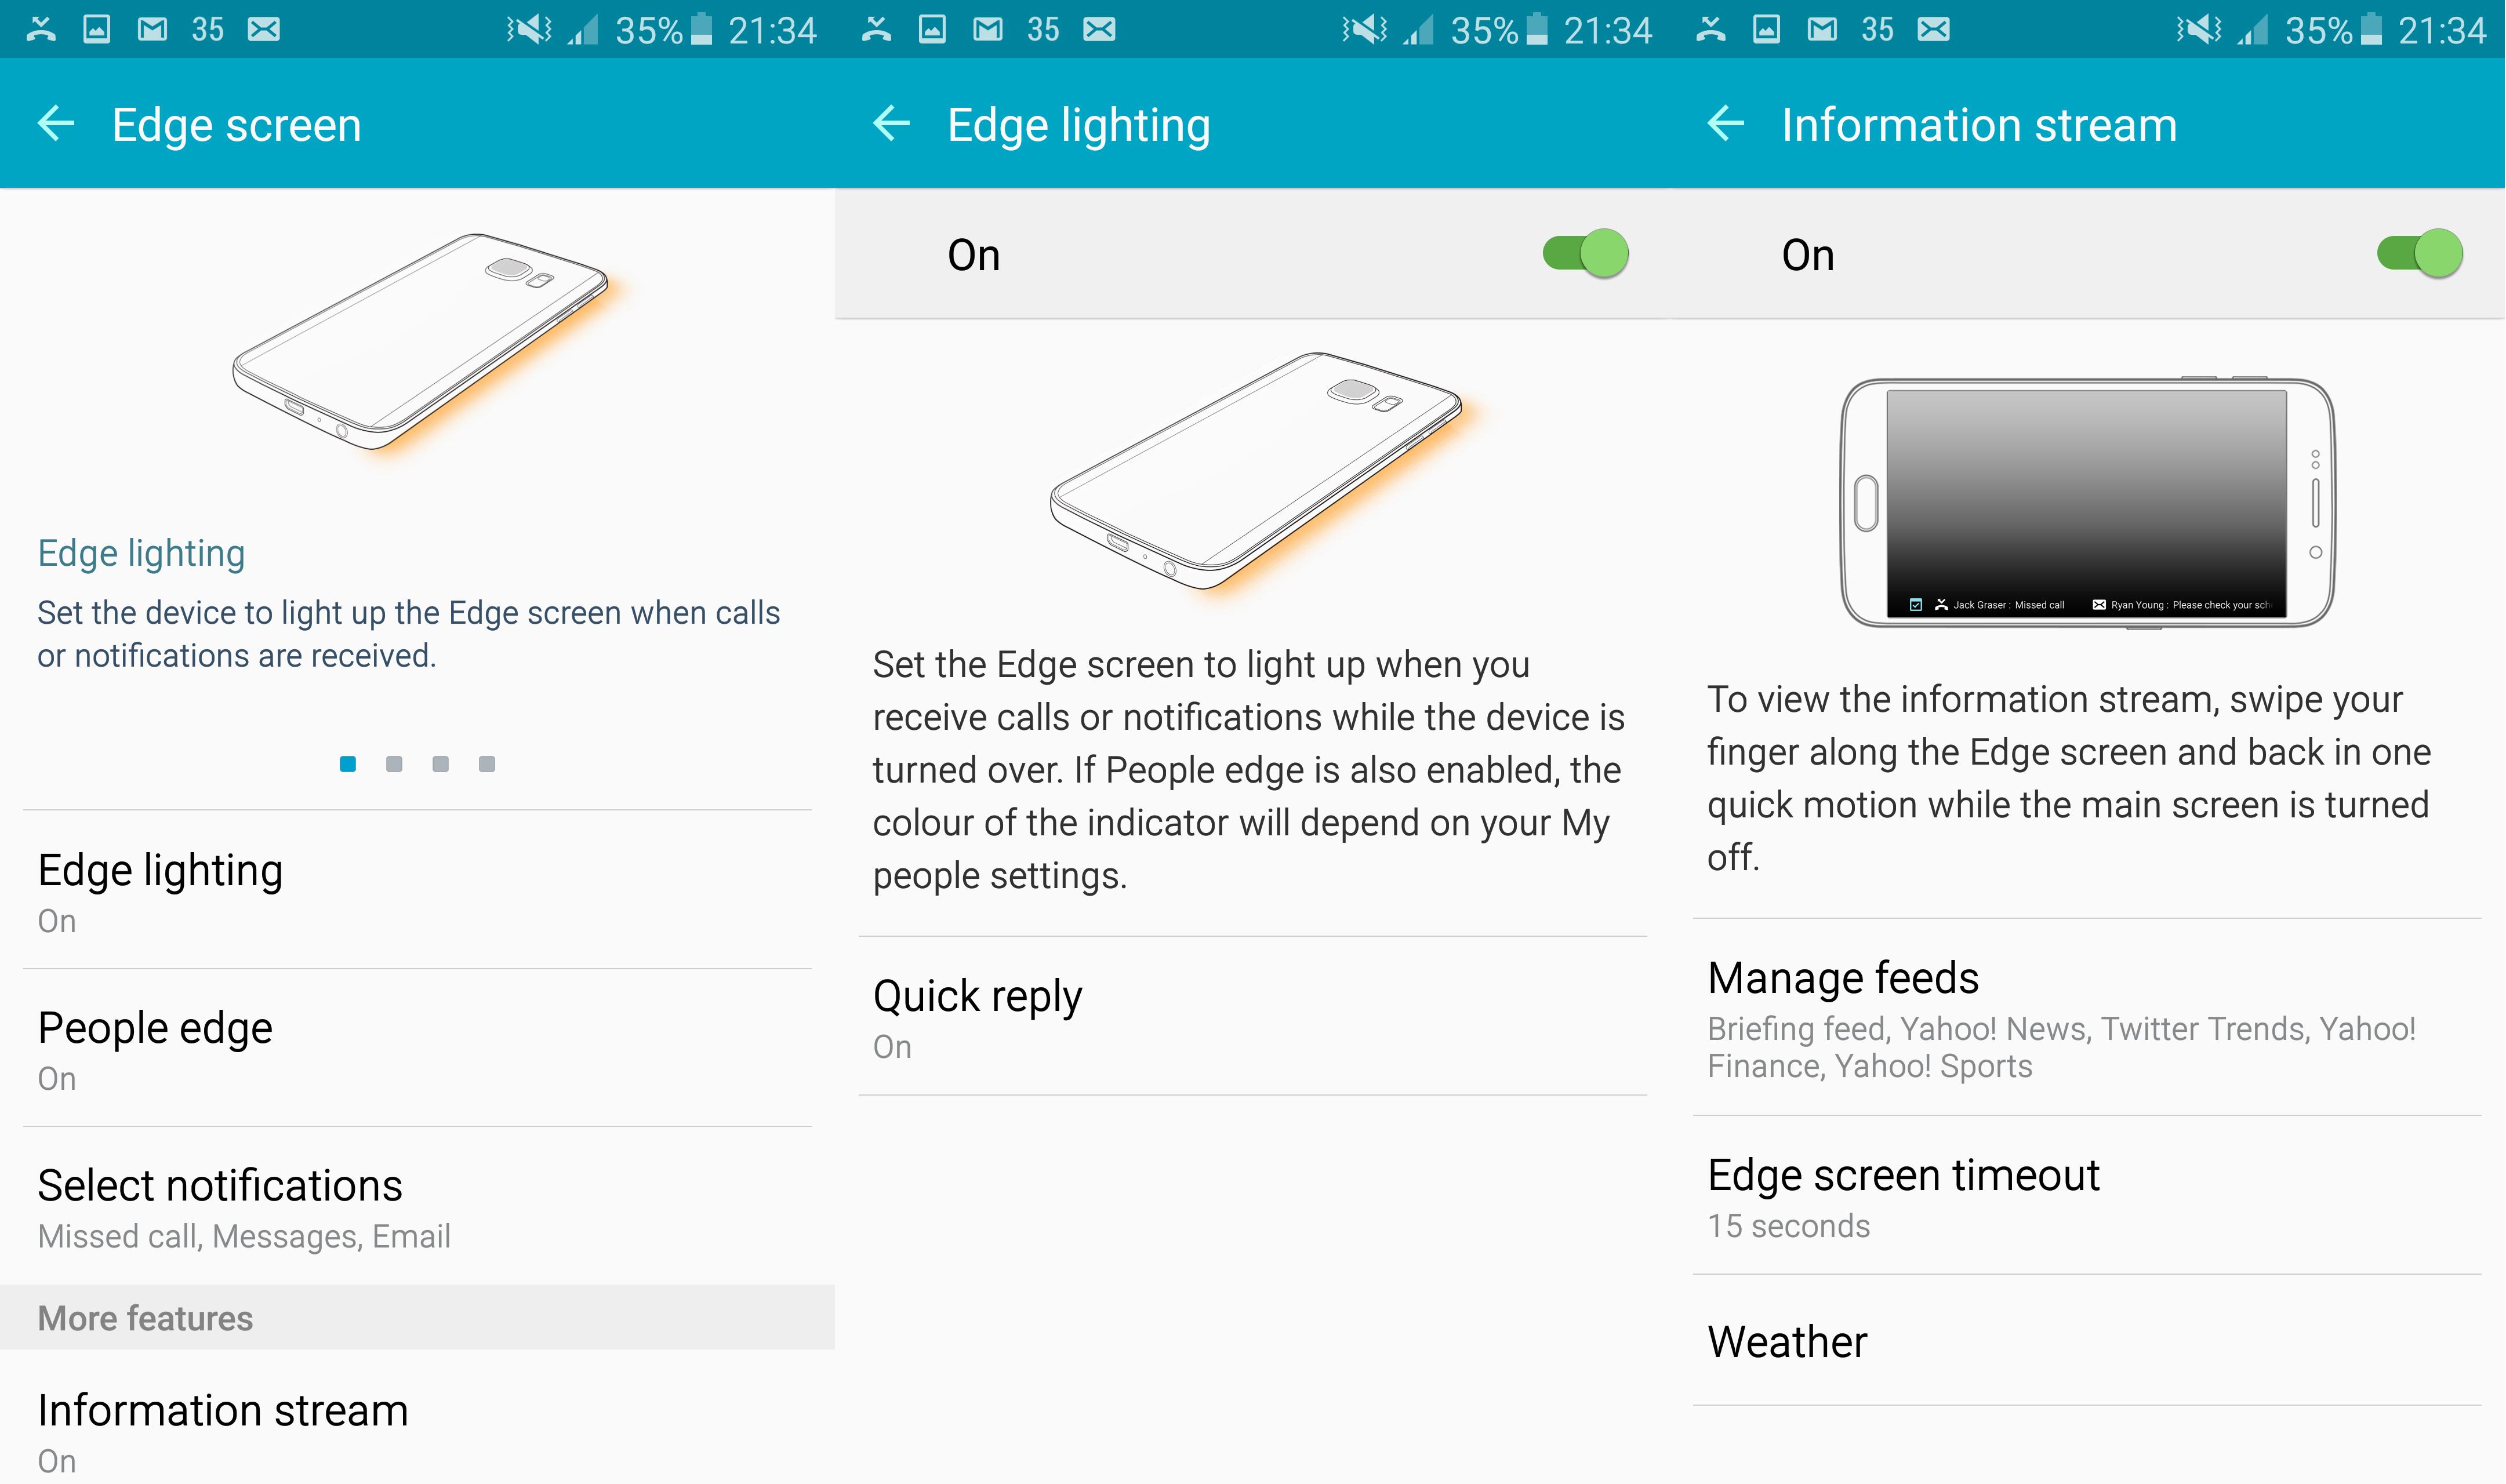 Samsung Galaxy S6 Edge Display Settings Information Stream Screen